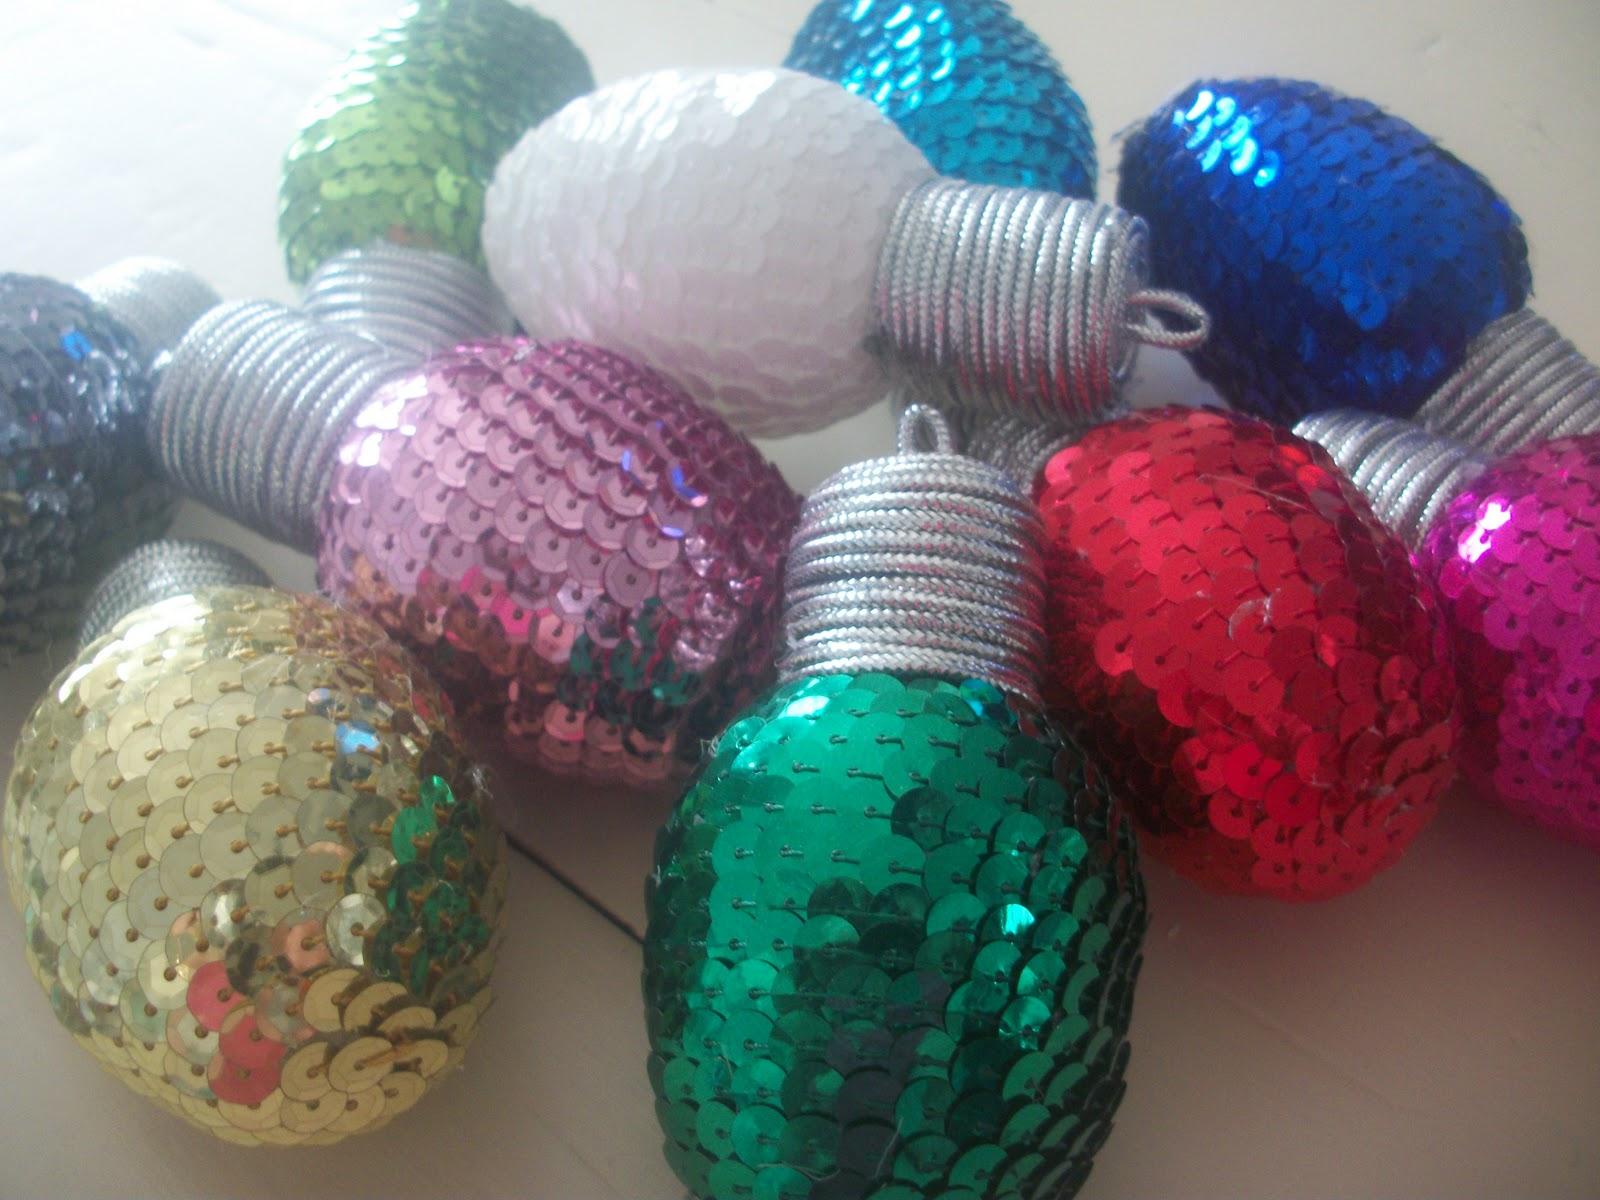 Styrofoam christmas ornaments - Haul Out The Holly Diy Styrofoam Christmas Lights